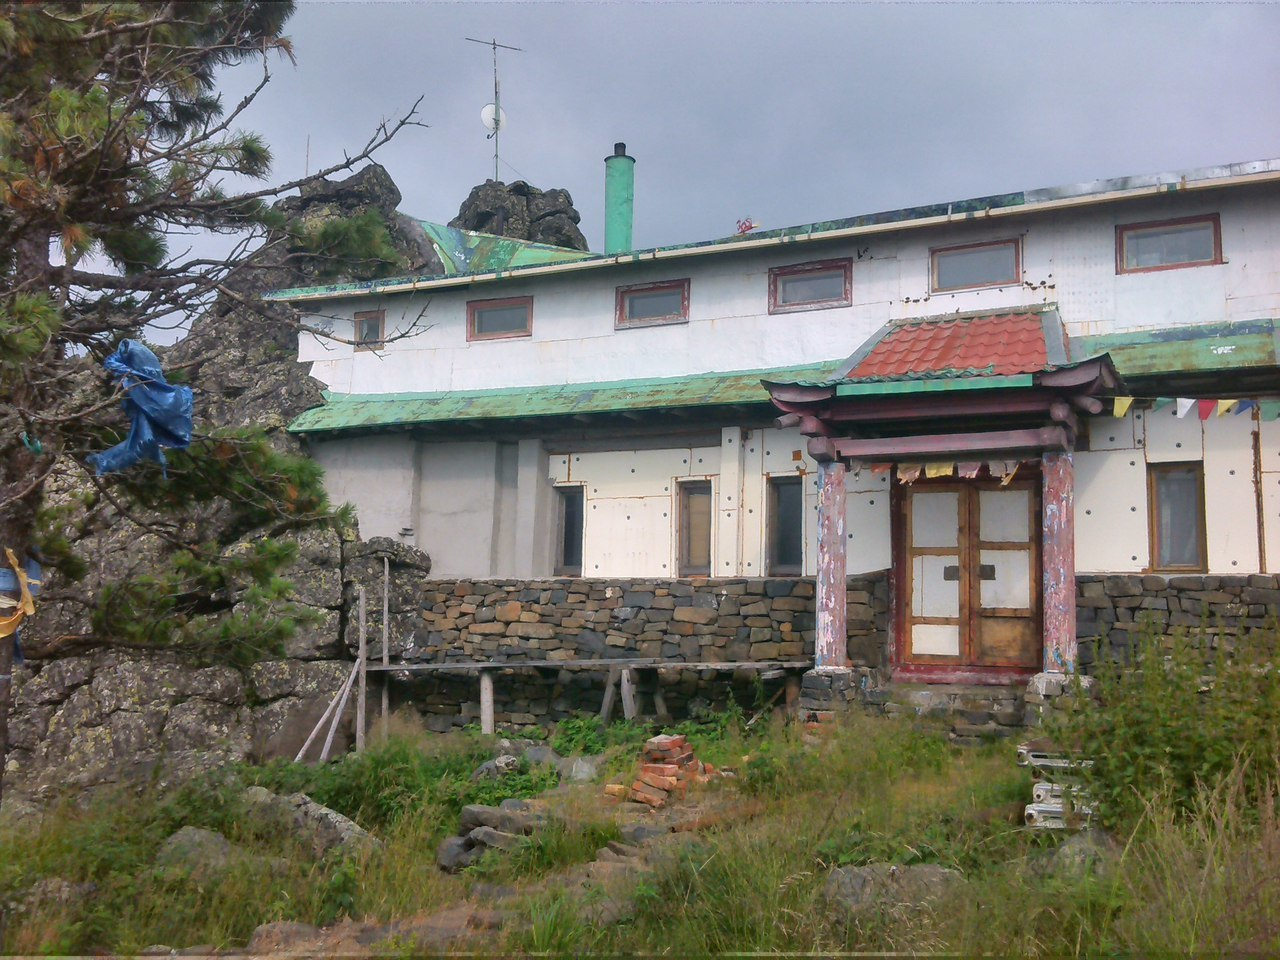 Буддийский монастырь Шад-Тчуп-Линг в Качканаре.